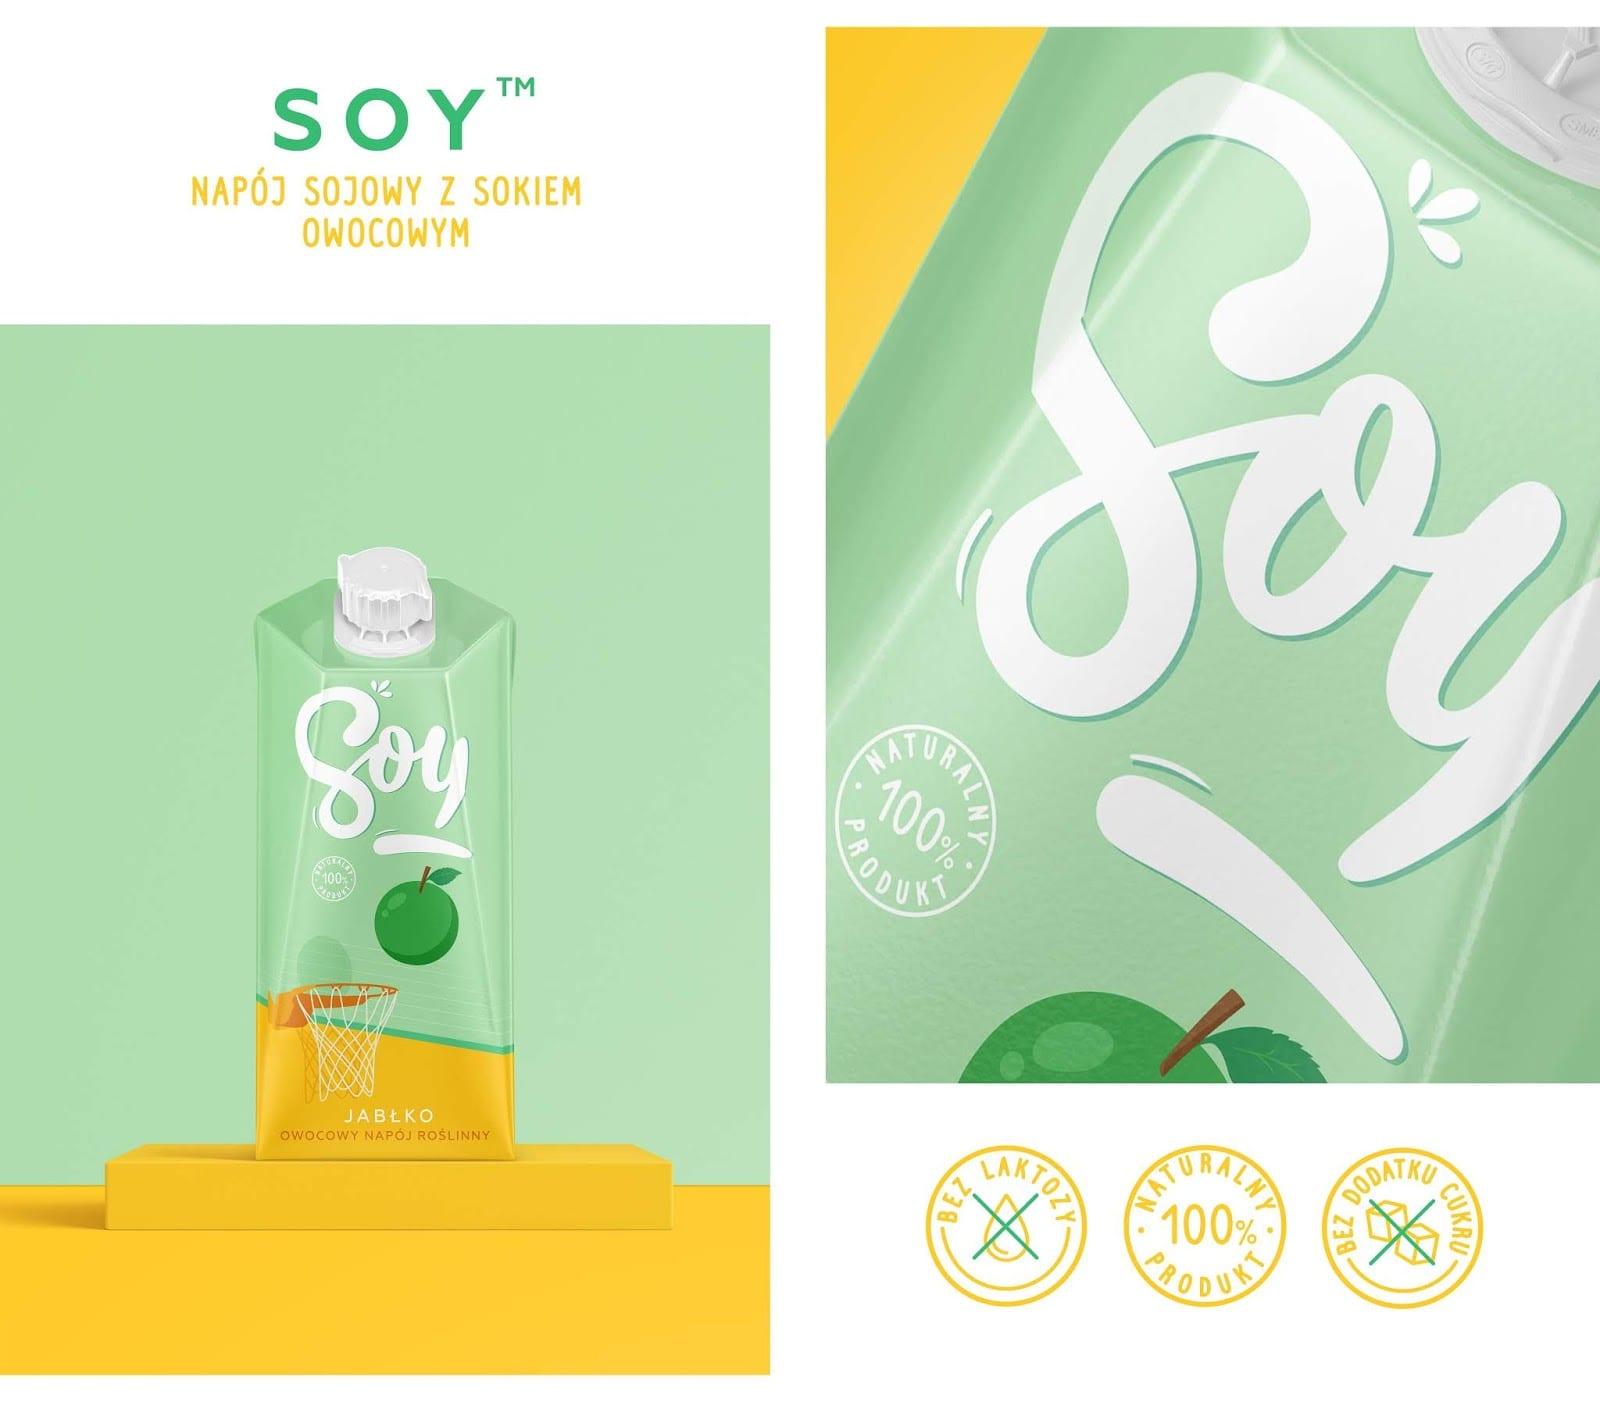 ach tie obaly – juicy soy drink 1 - Ach, tie obaly – Soy Drink